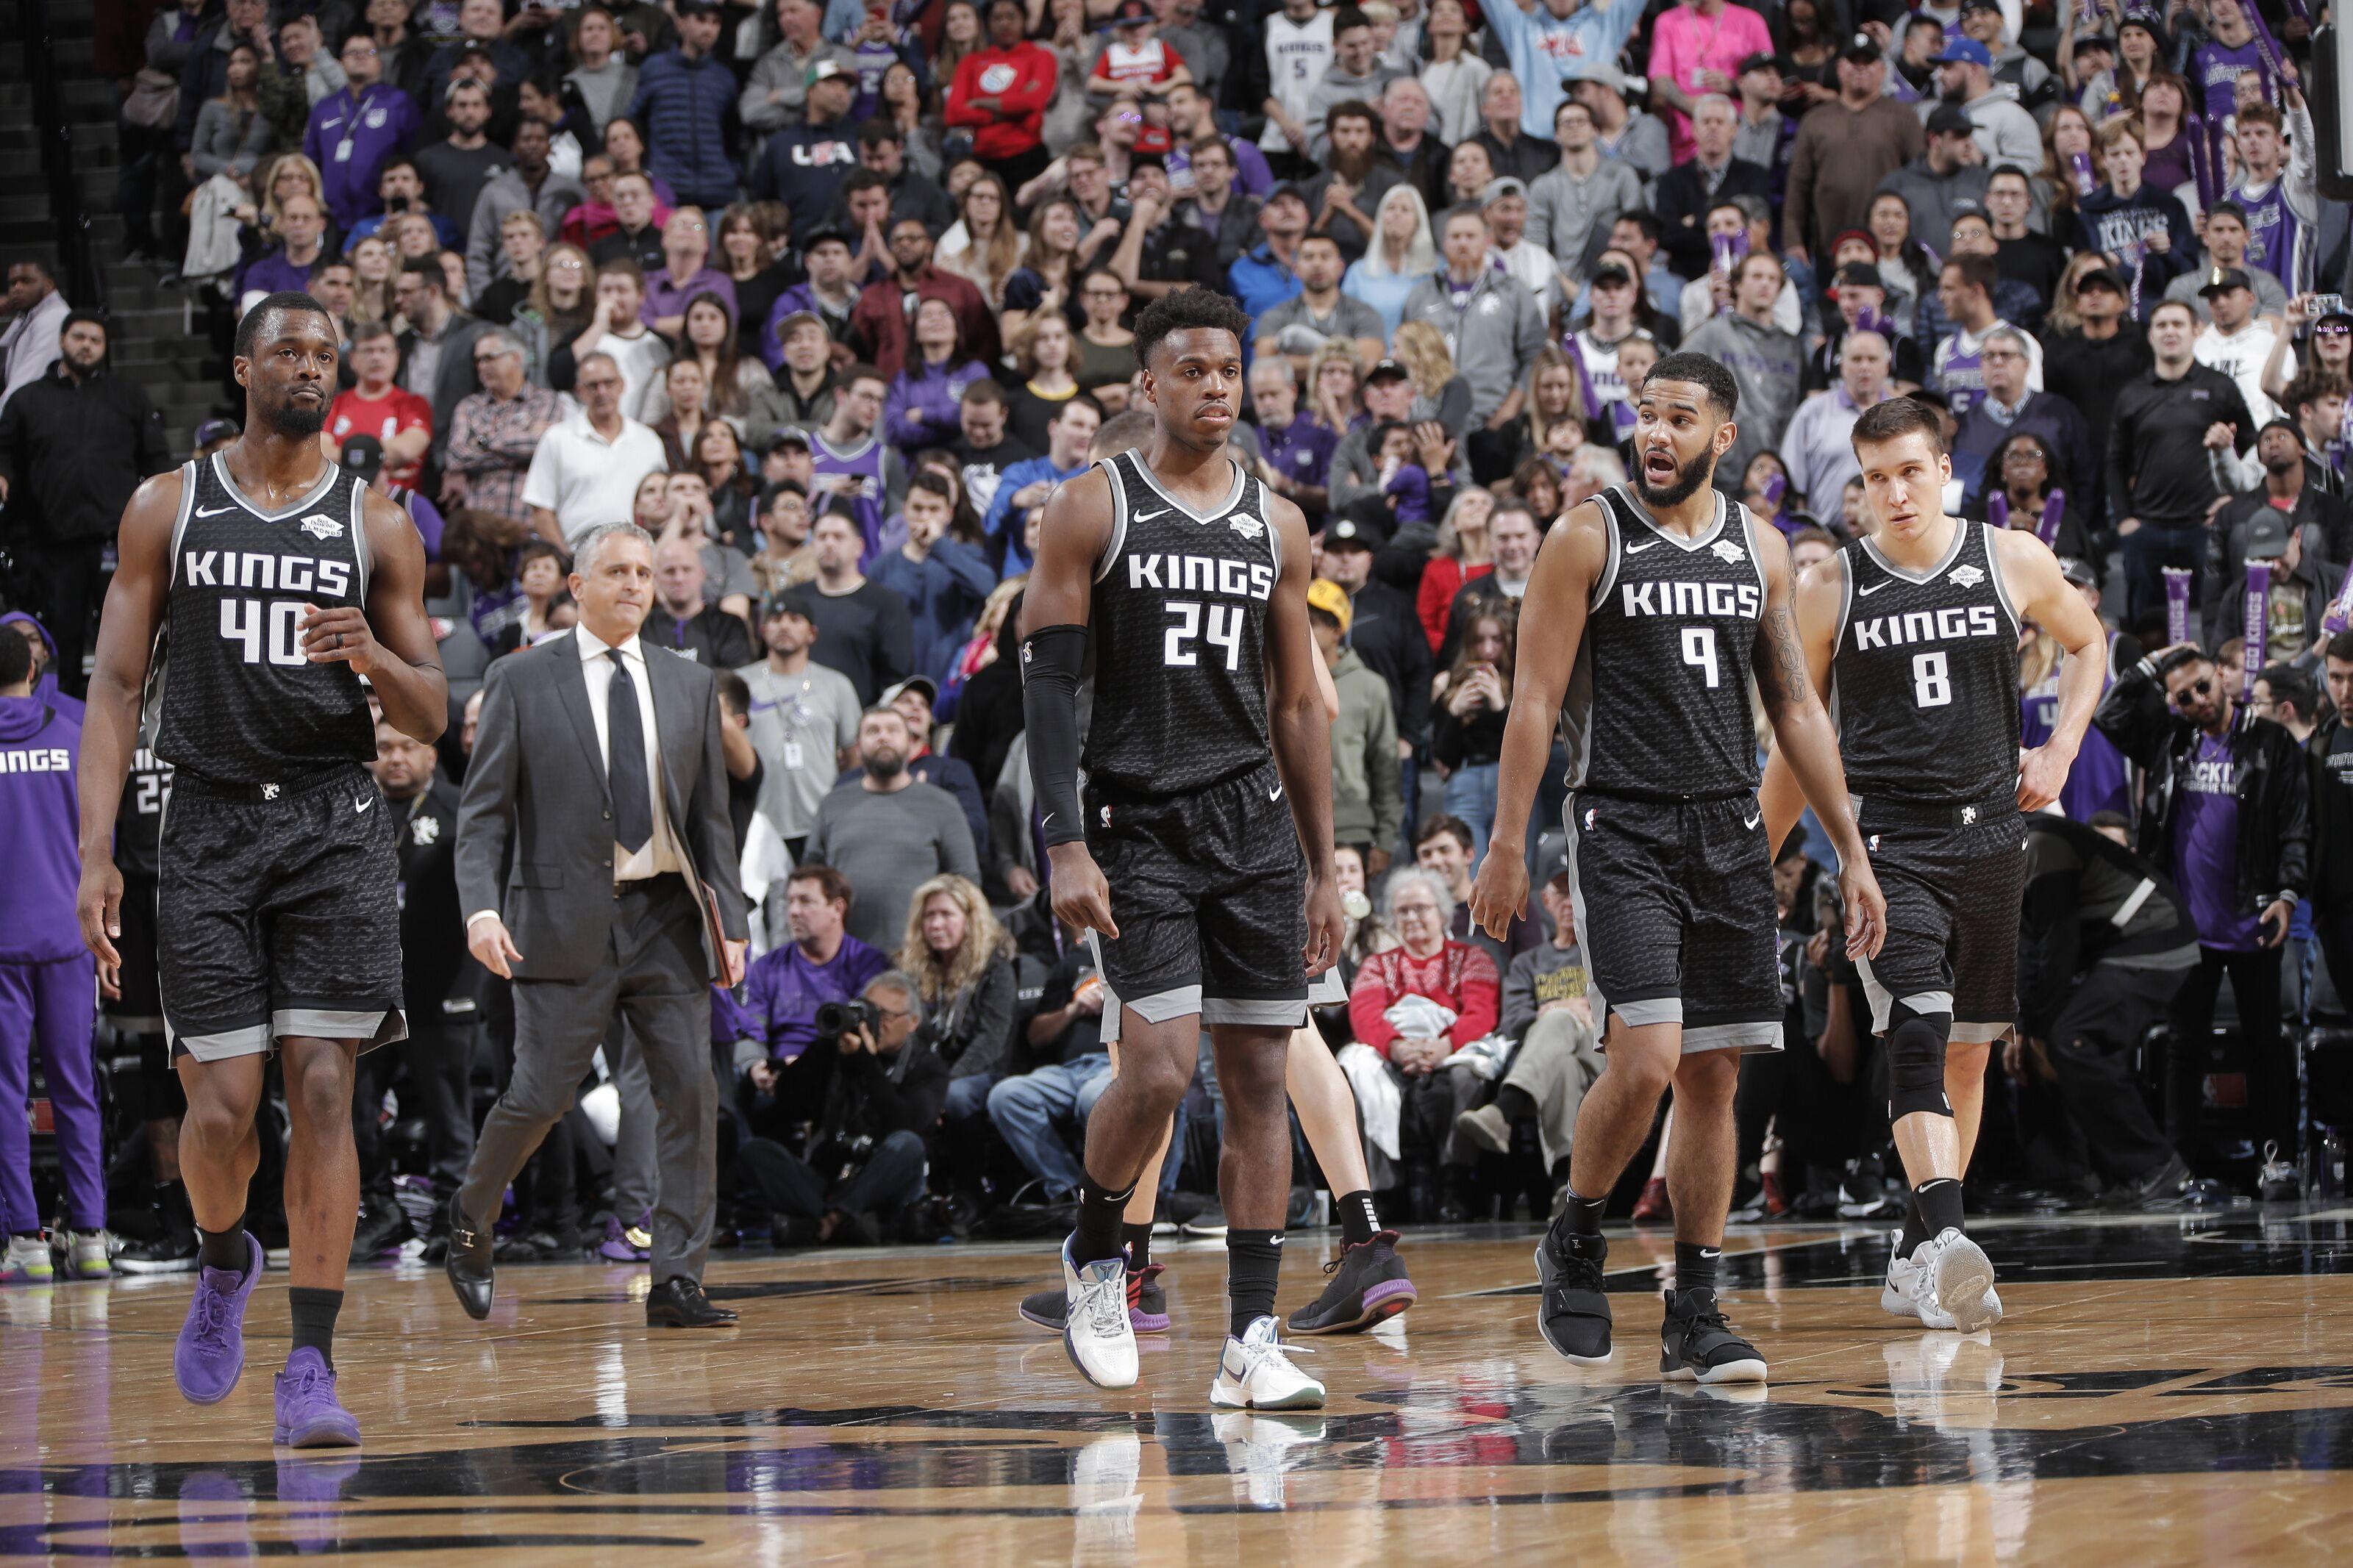 Kings vs. Wolves: Odds, Injuries, & Predictions